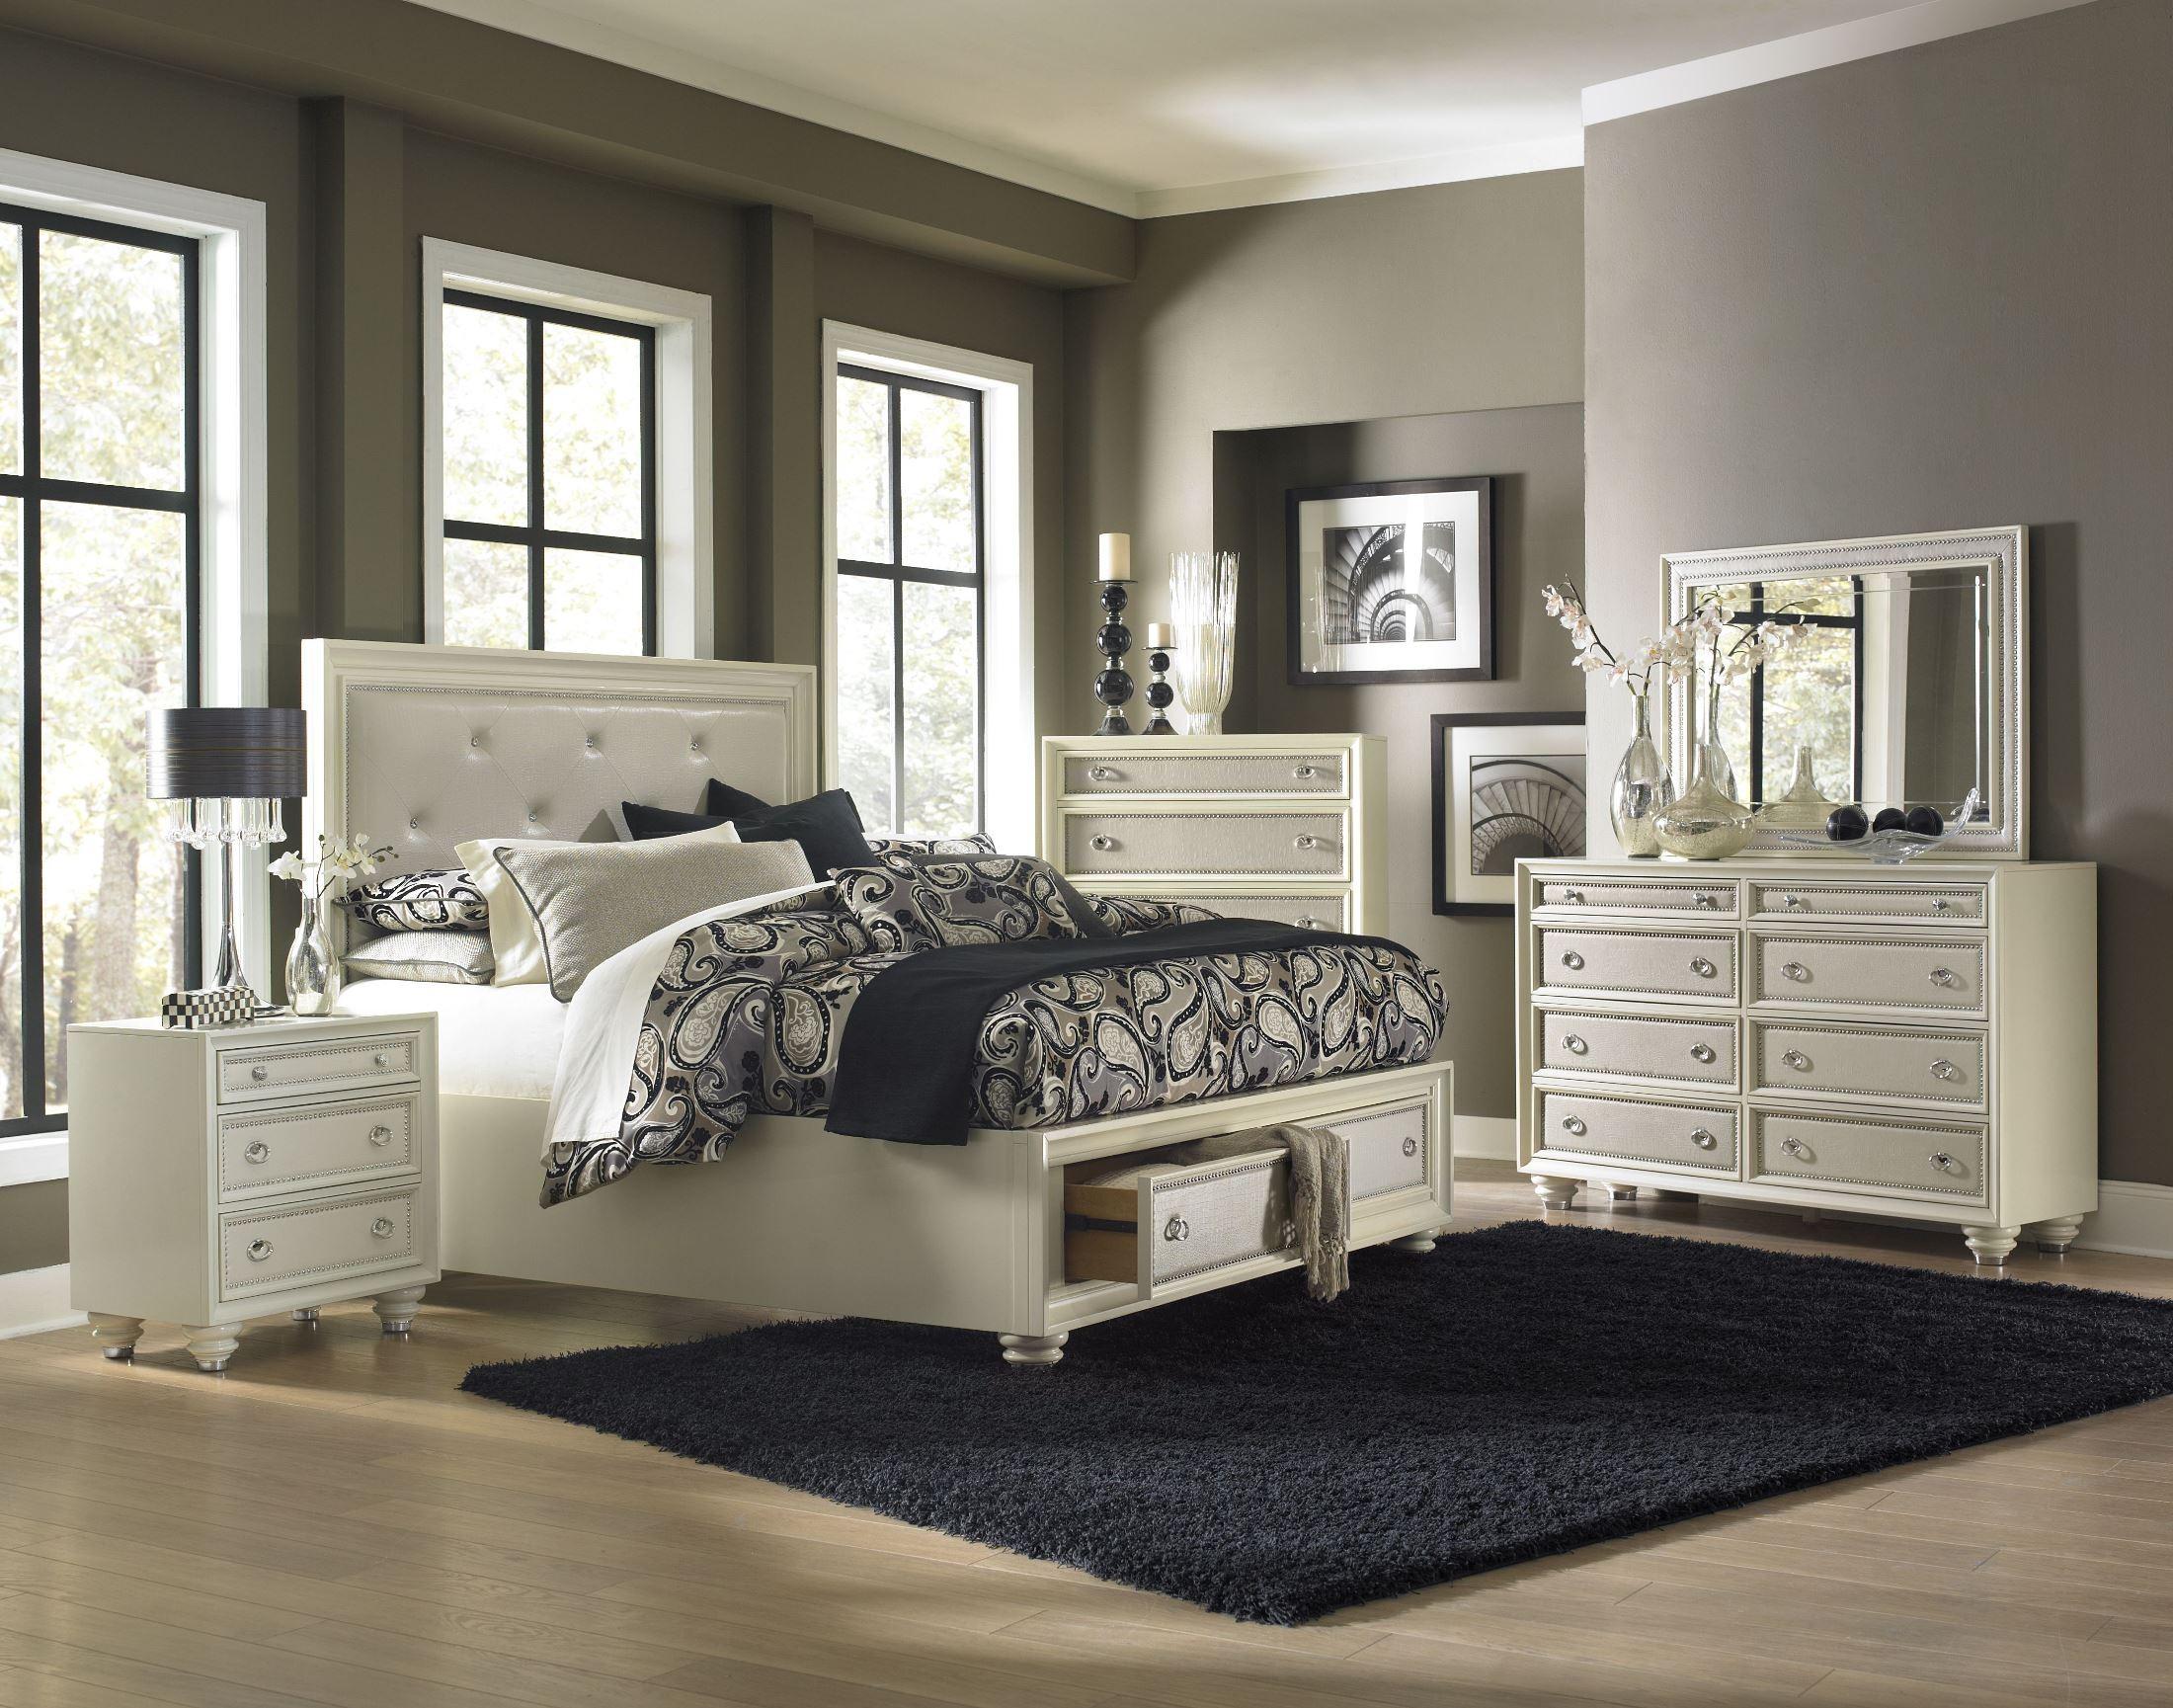 diamond island storage bedroom set from magnussen home. Black Bedroom Furniture Sets. Home Design Ideas